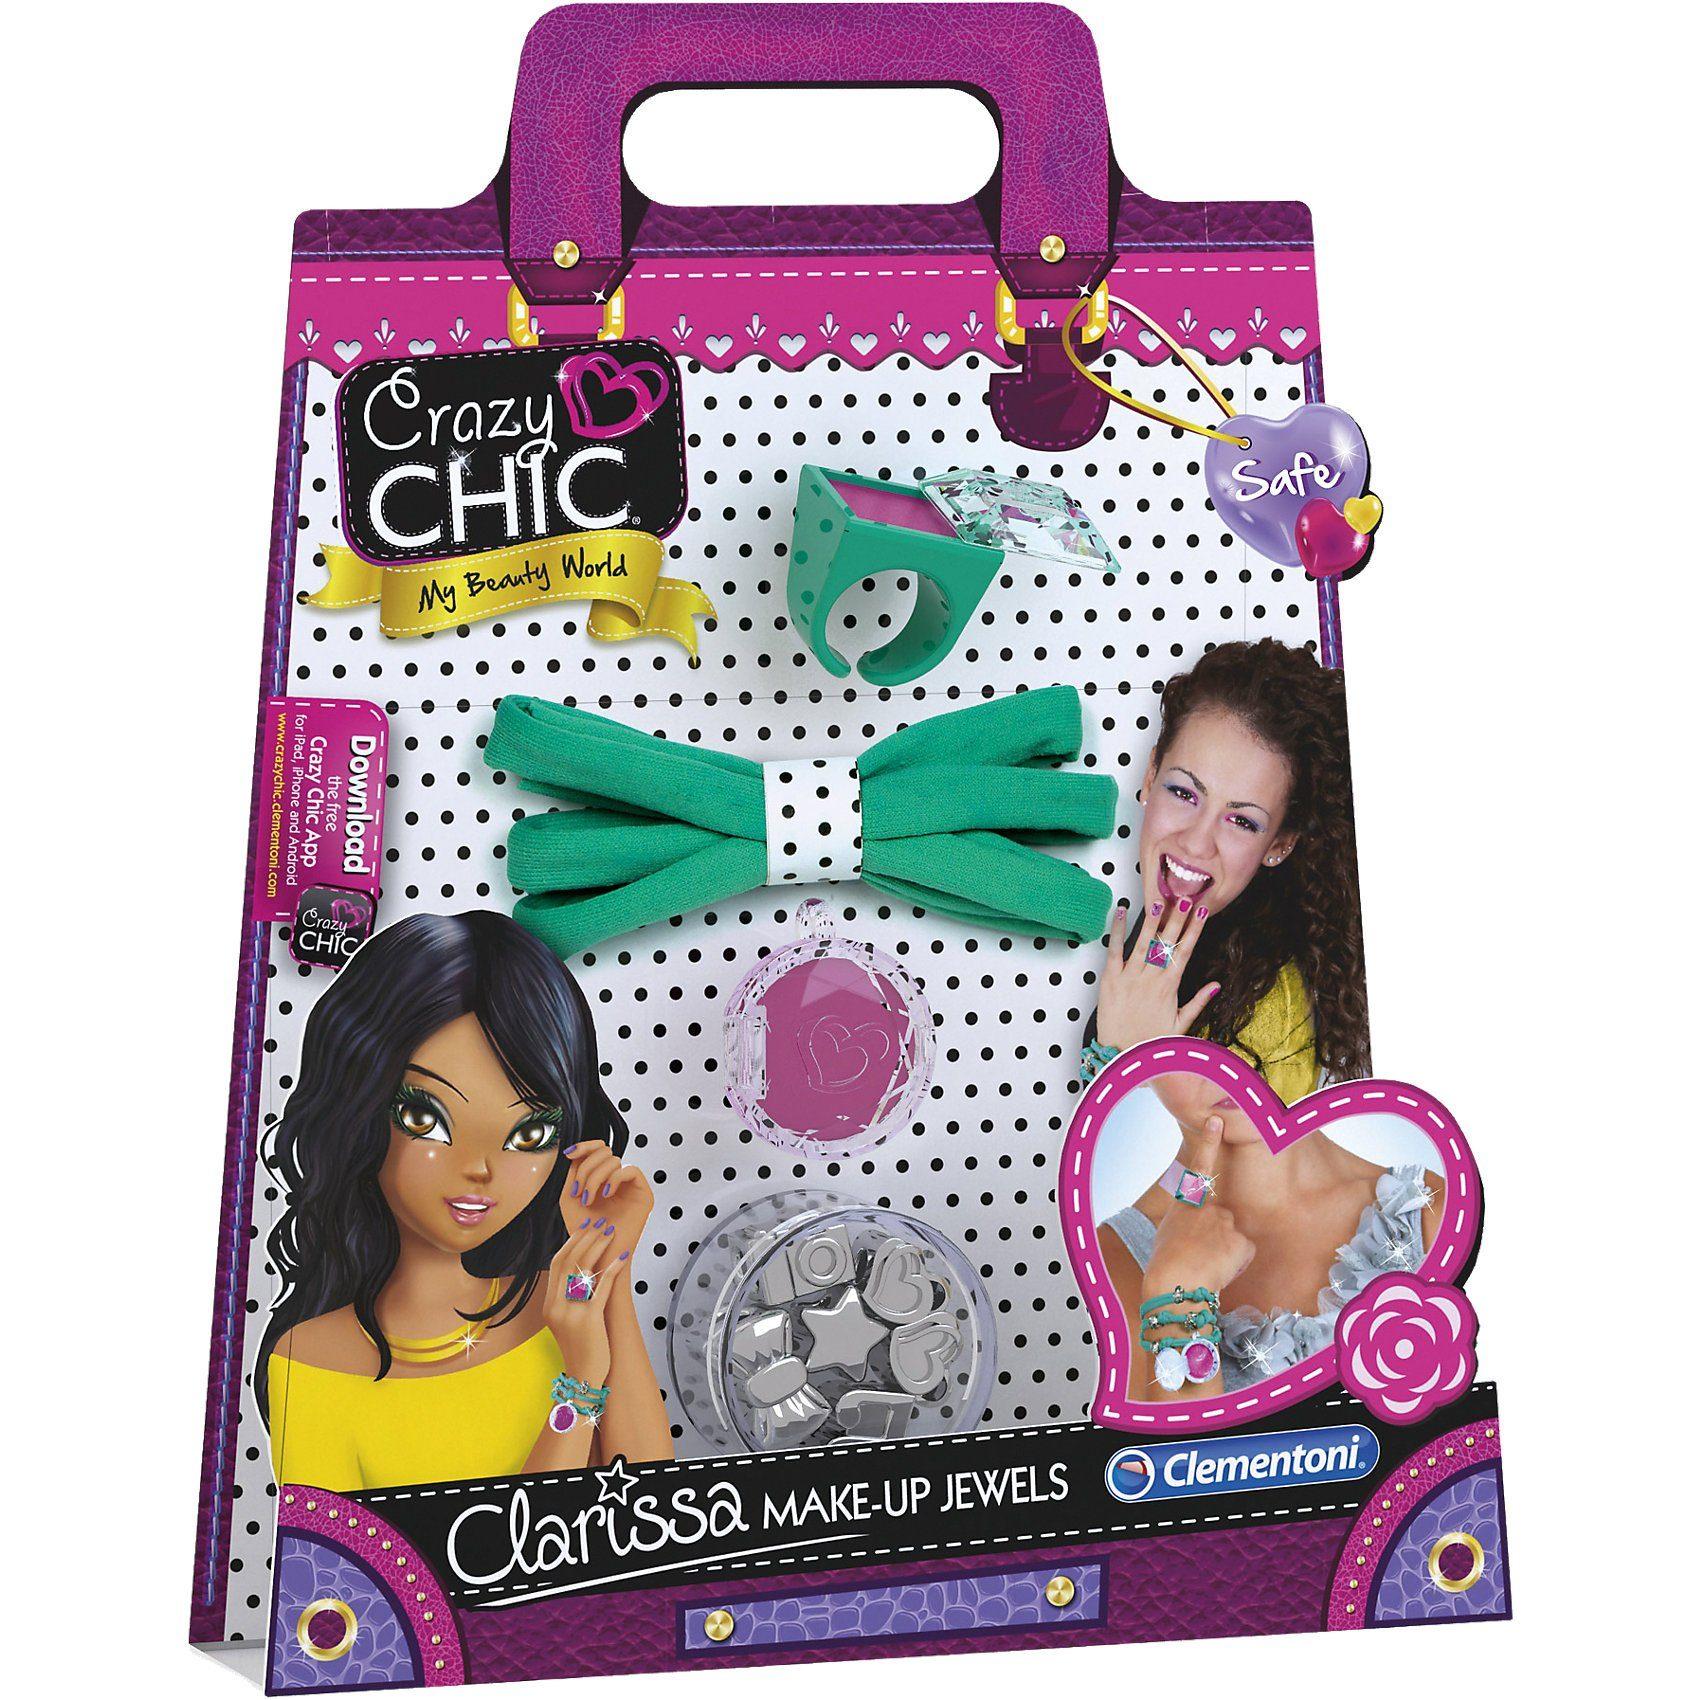 Clementoni Crazy Chic - Clarissas Make-Up Jewels